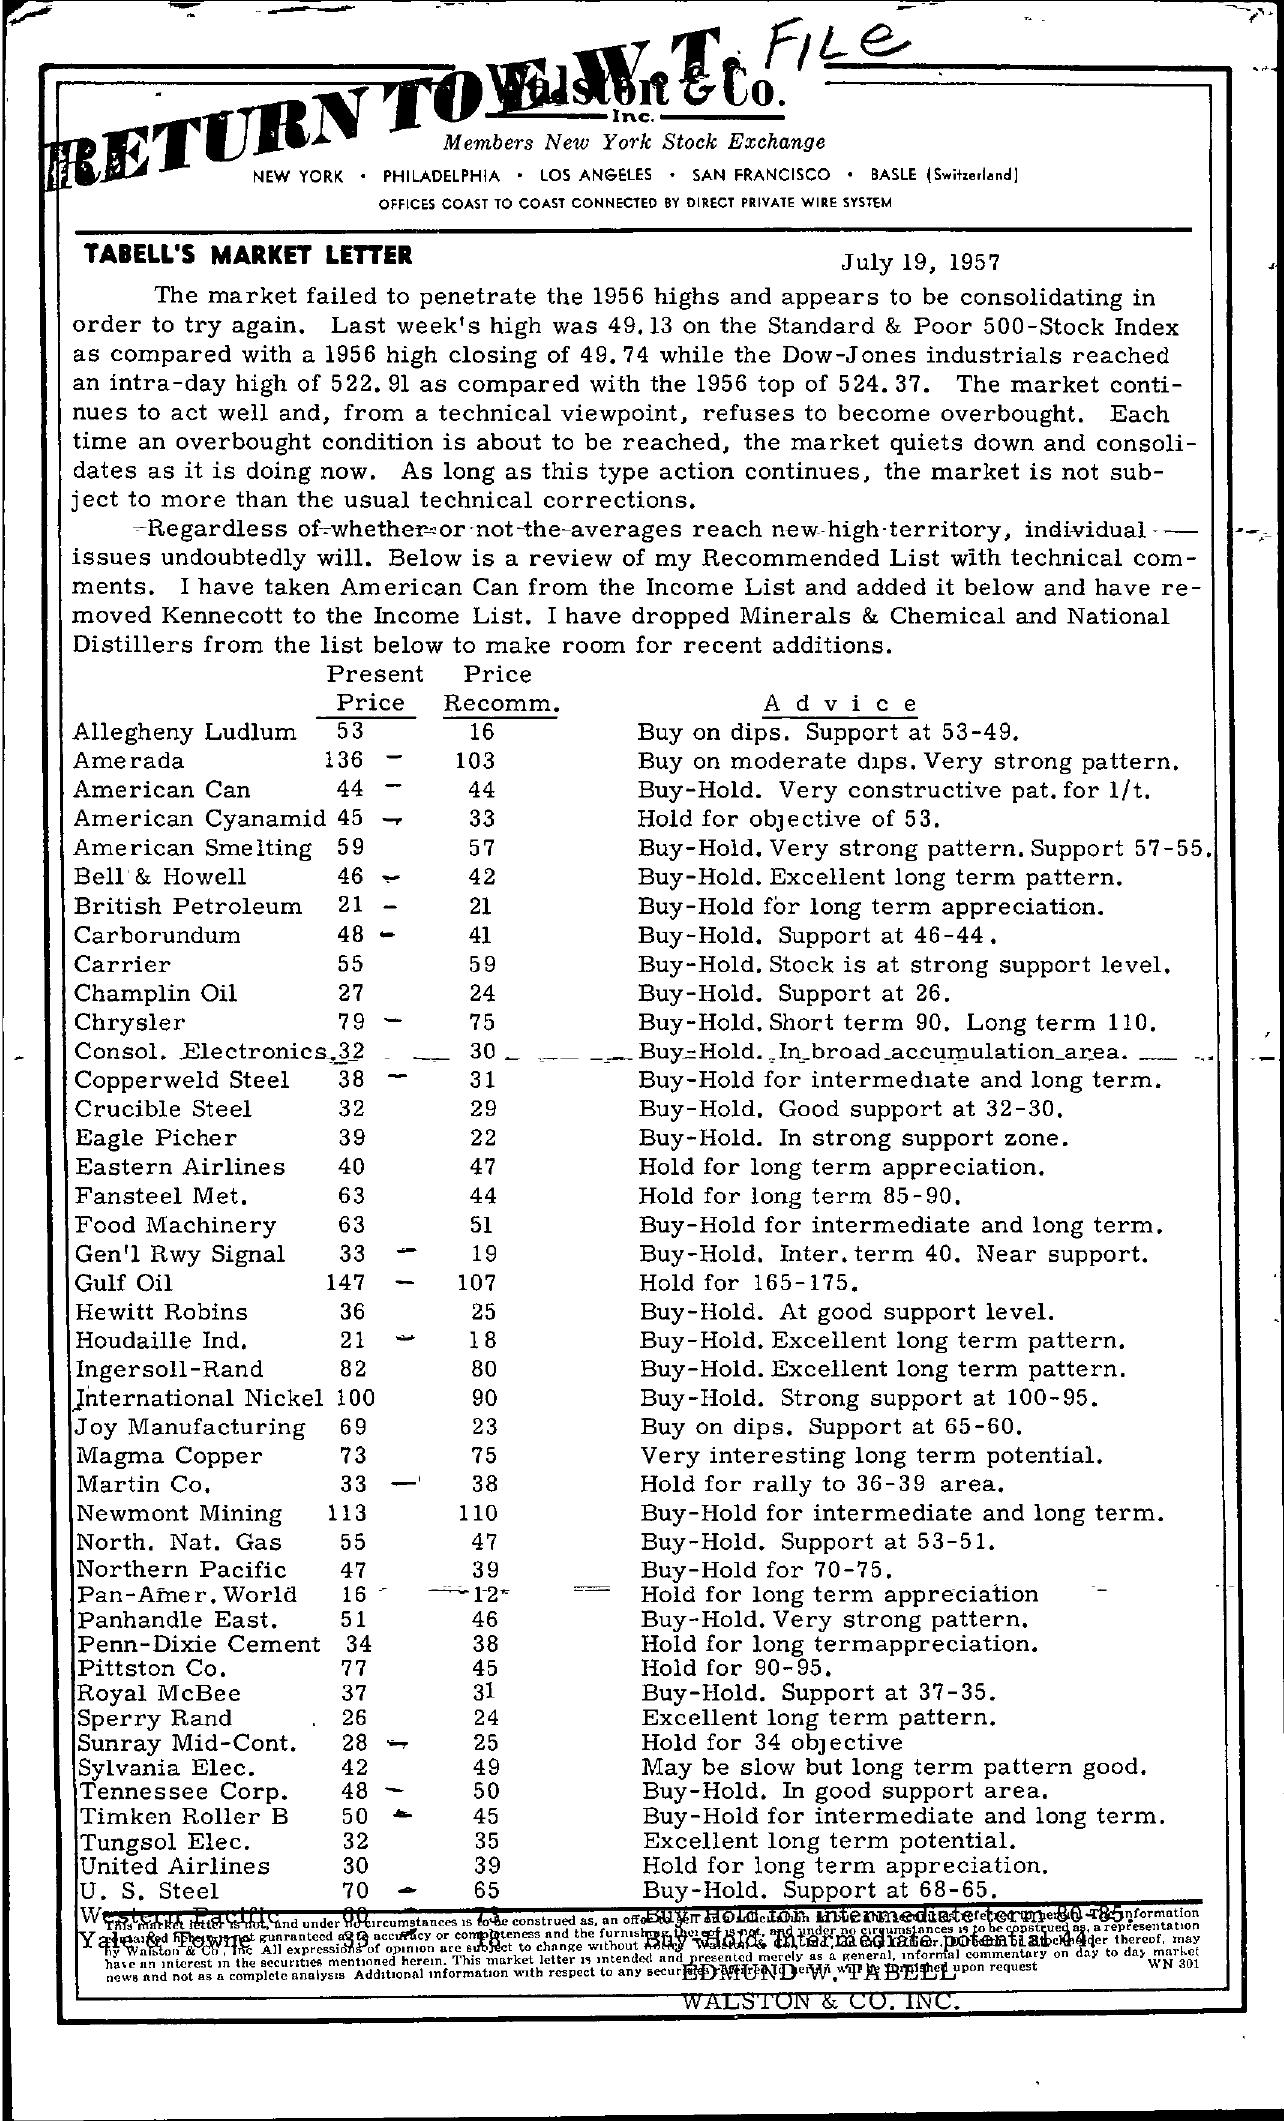 Tabell's Market Letter - July 19, 1957